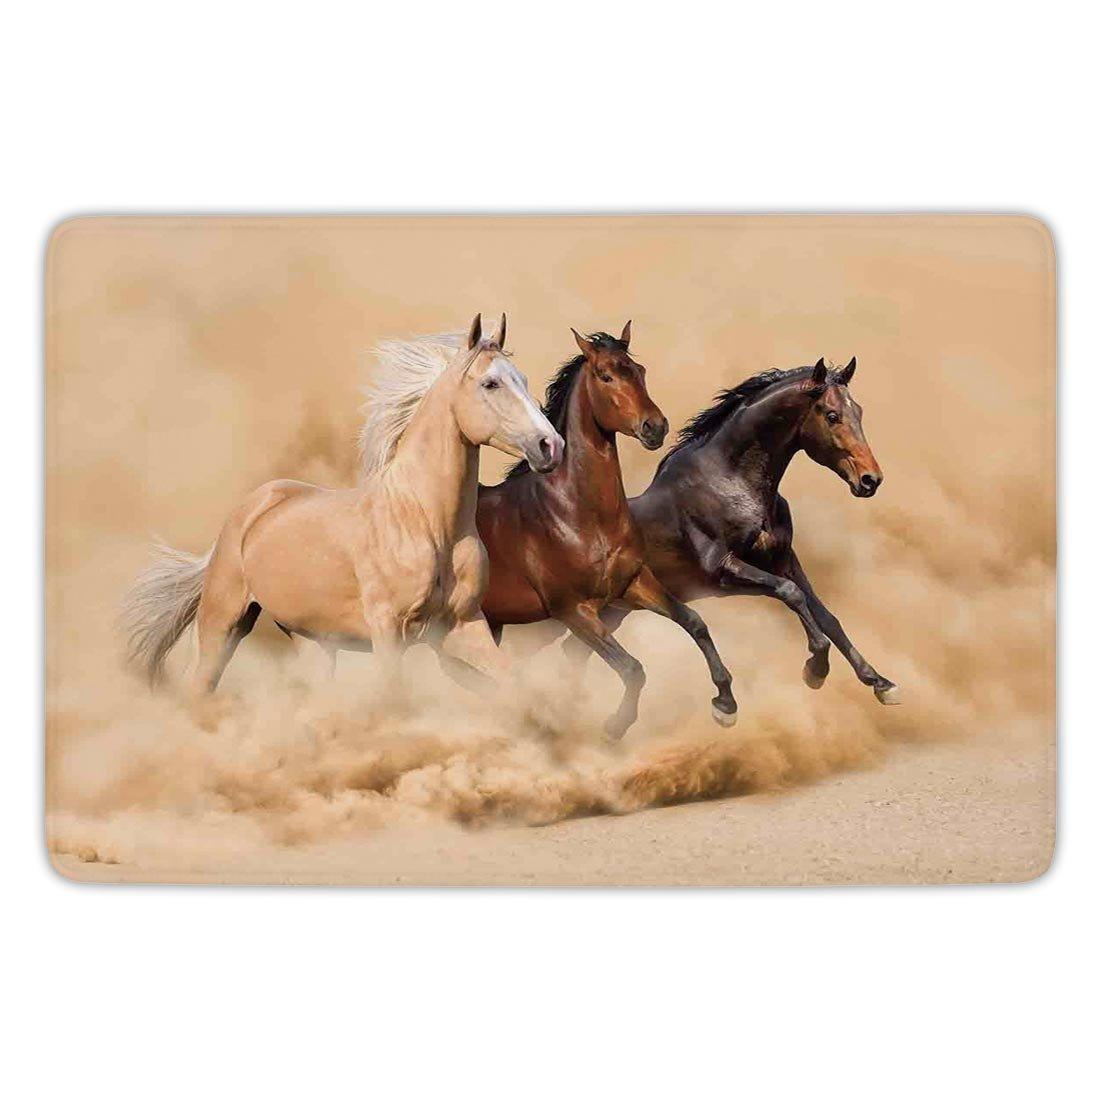 Bathroom Bath Rug Kitchen Floor Mat Carpet,Horses,Three Horse Running in Desert Storm Mythical Mystic Messenger Animals Habitat Print,Cream Brown,Flannel Microfiber Non-slip Soft Absorbent